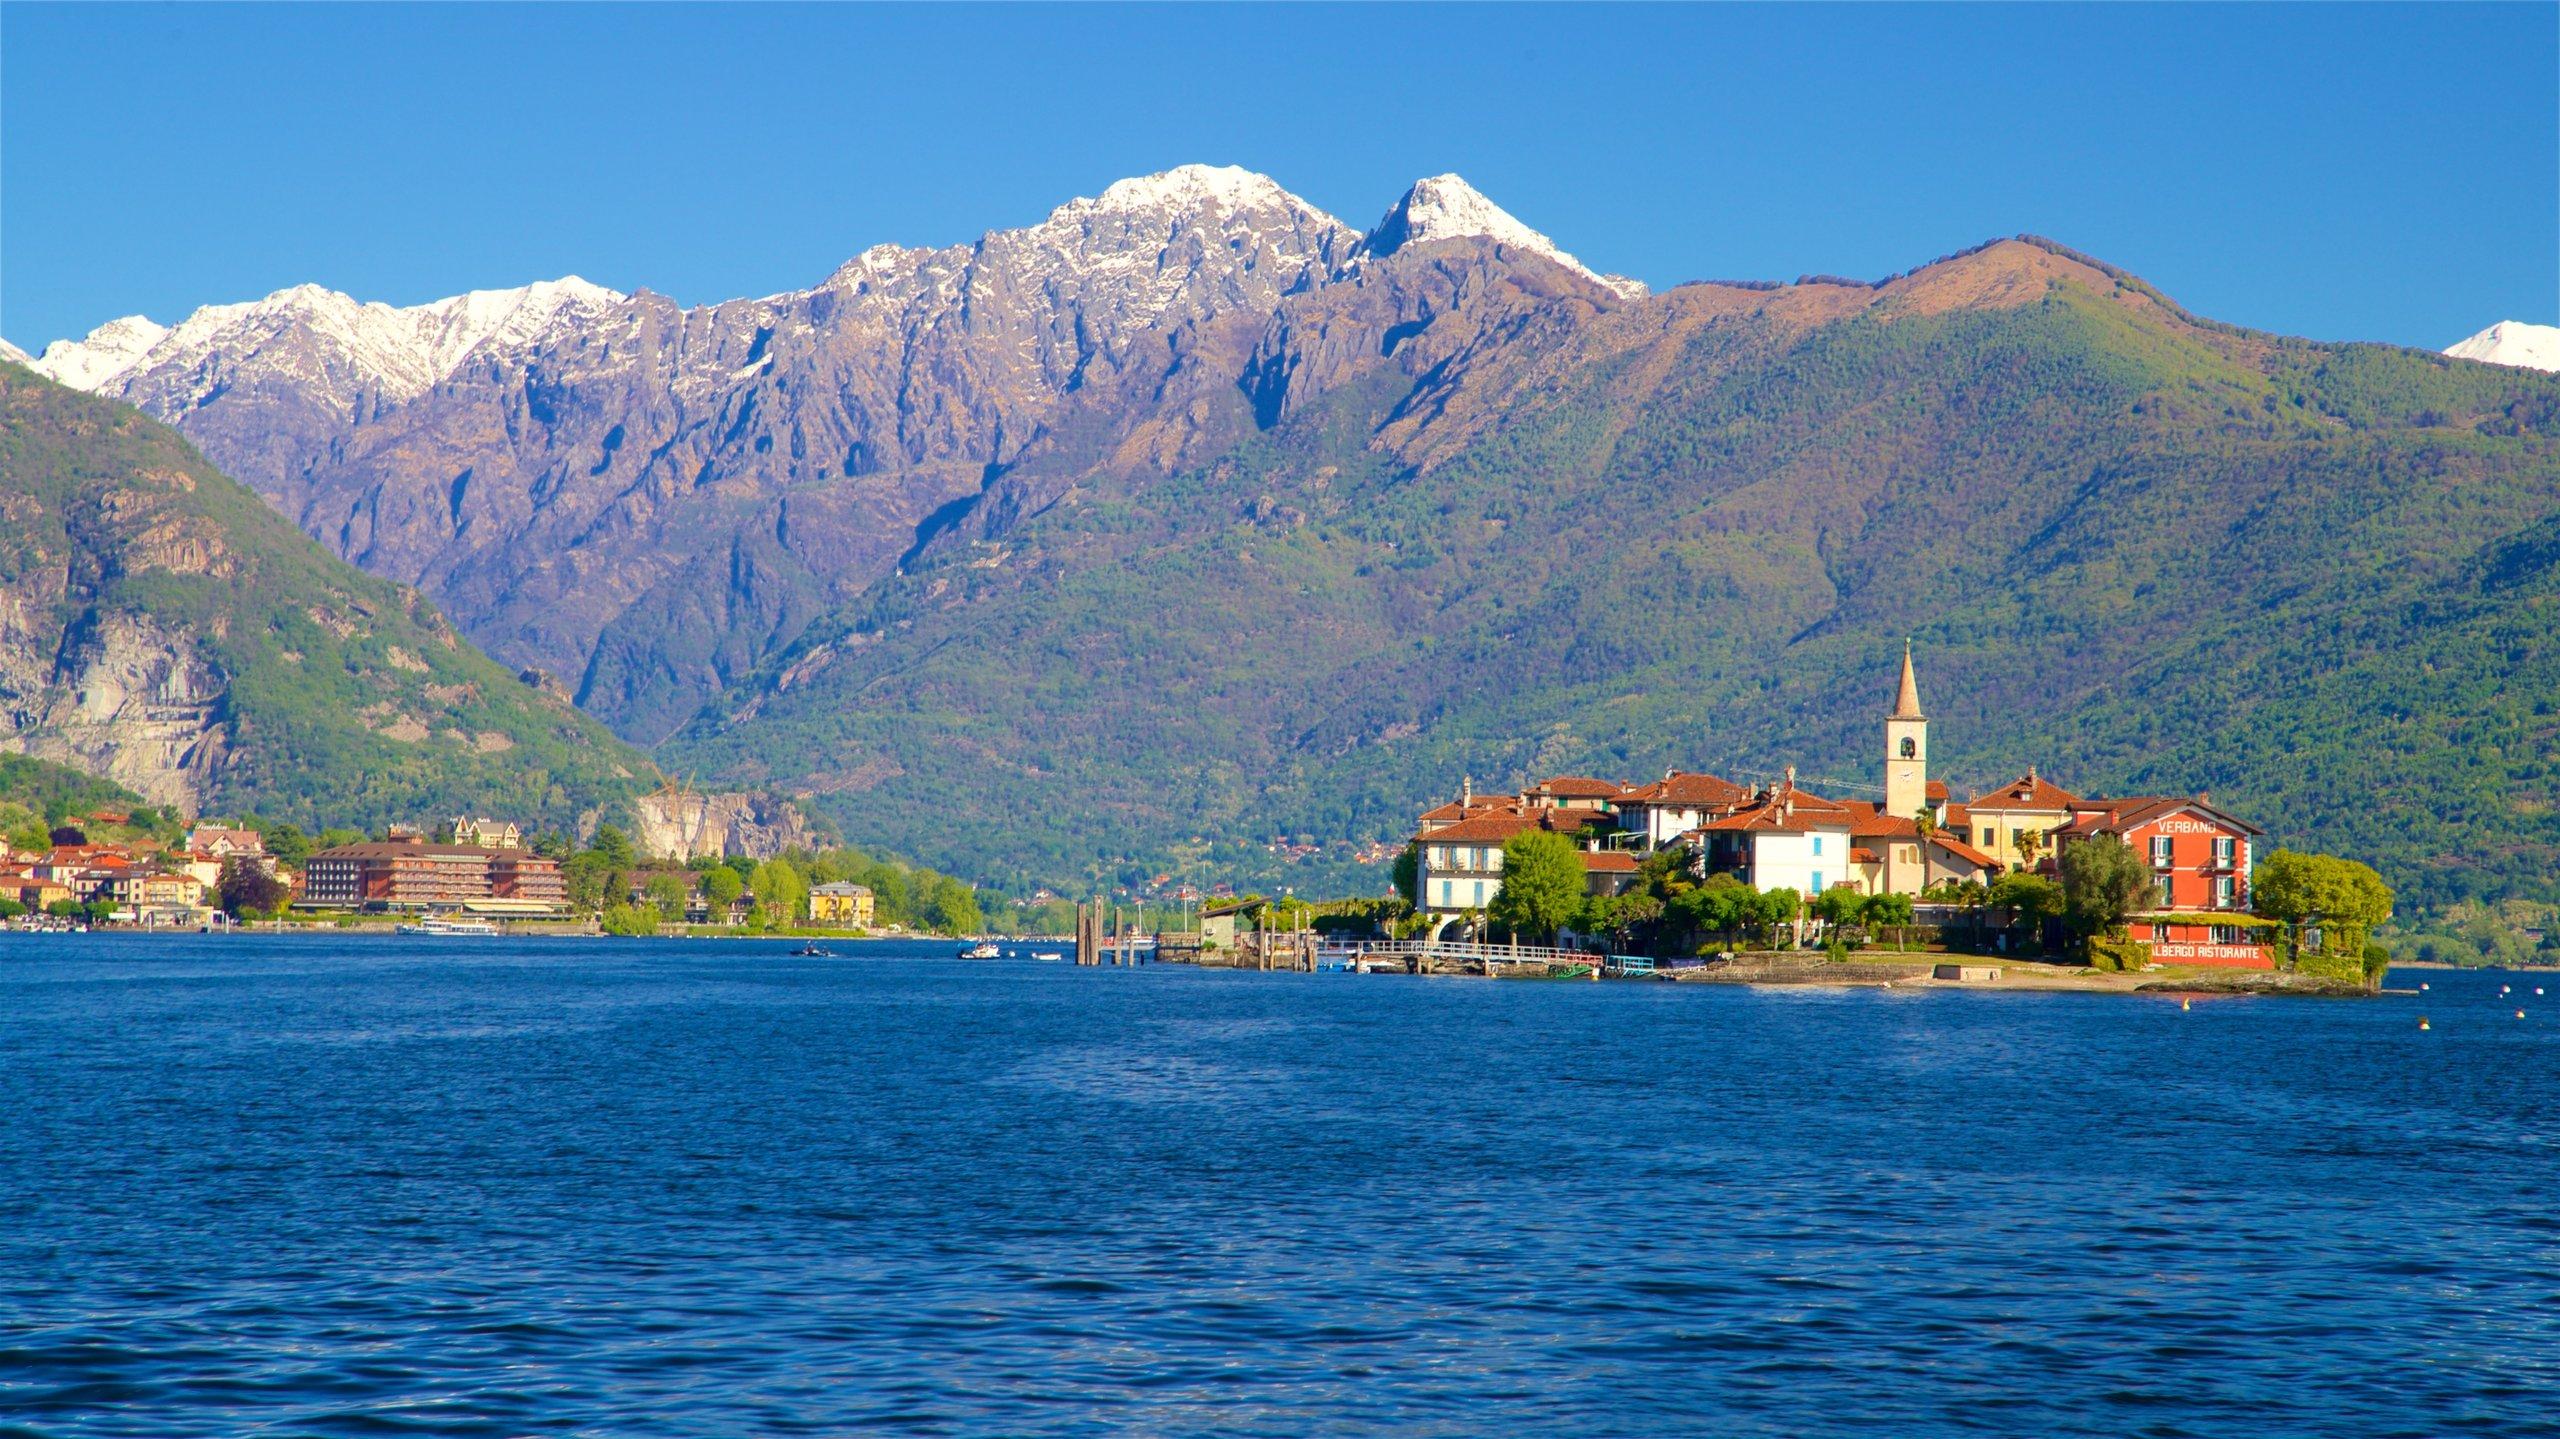 Province of Verbano-Cusio-Ossola, Piedmont, Italy